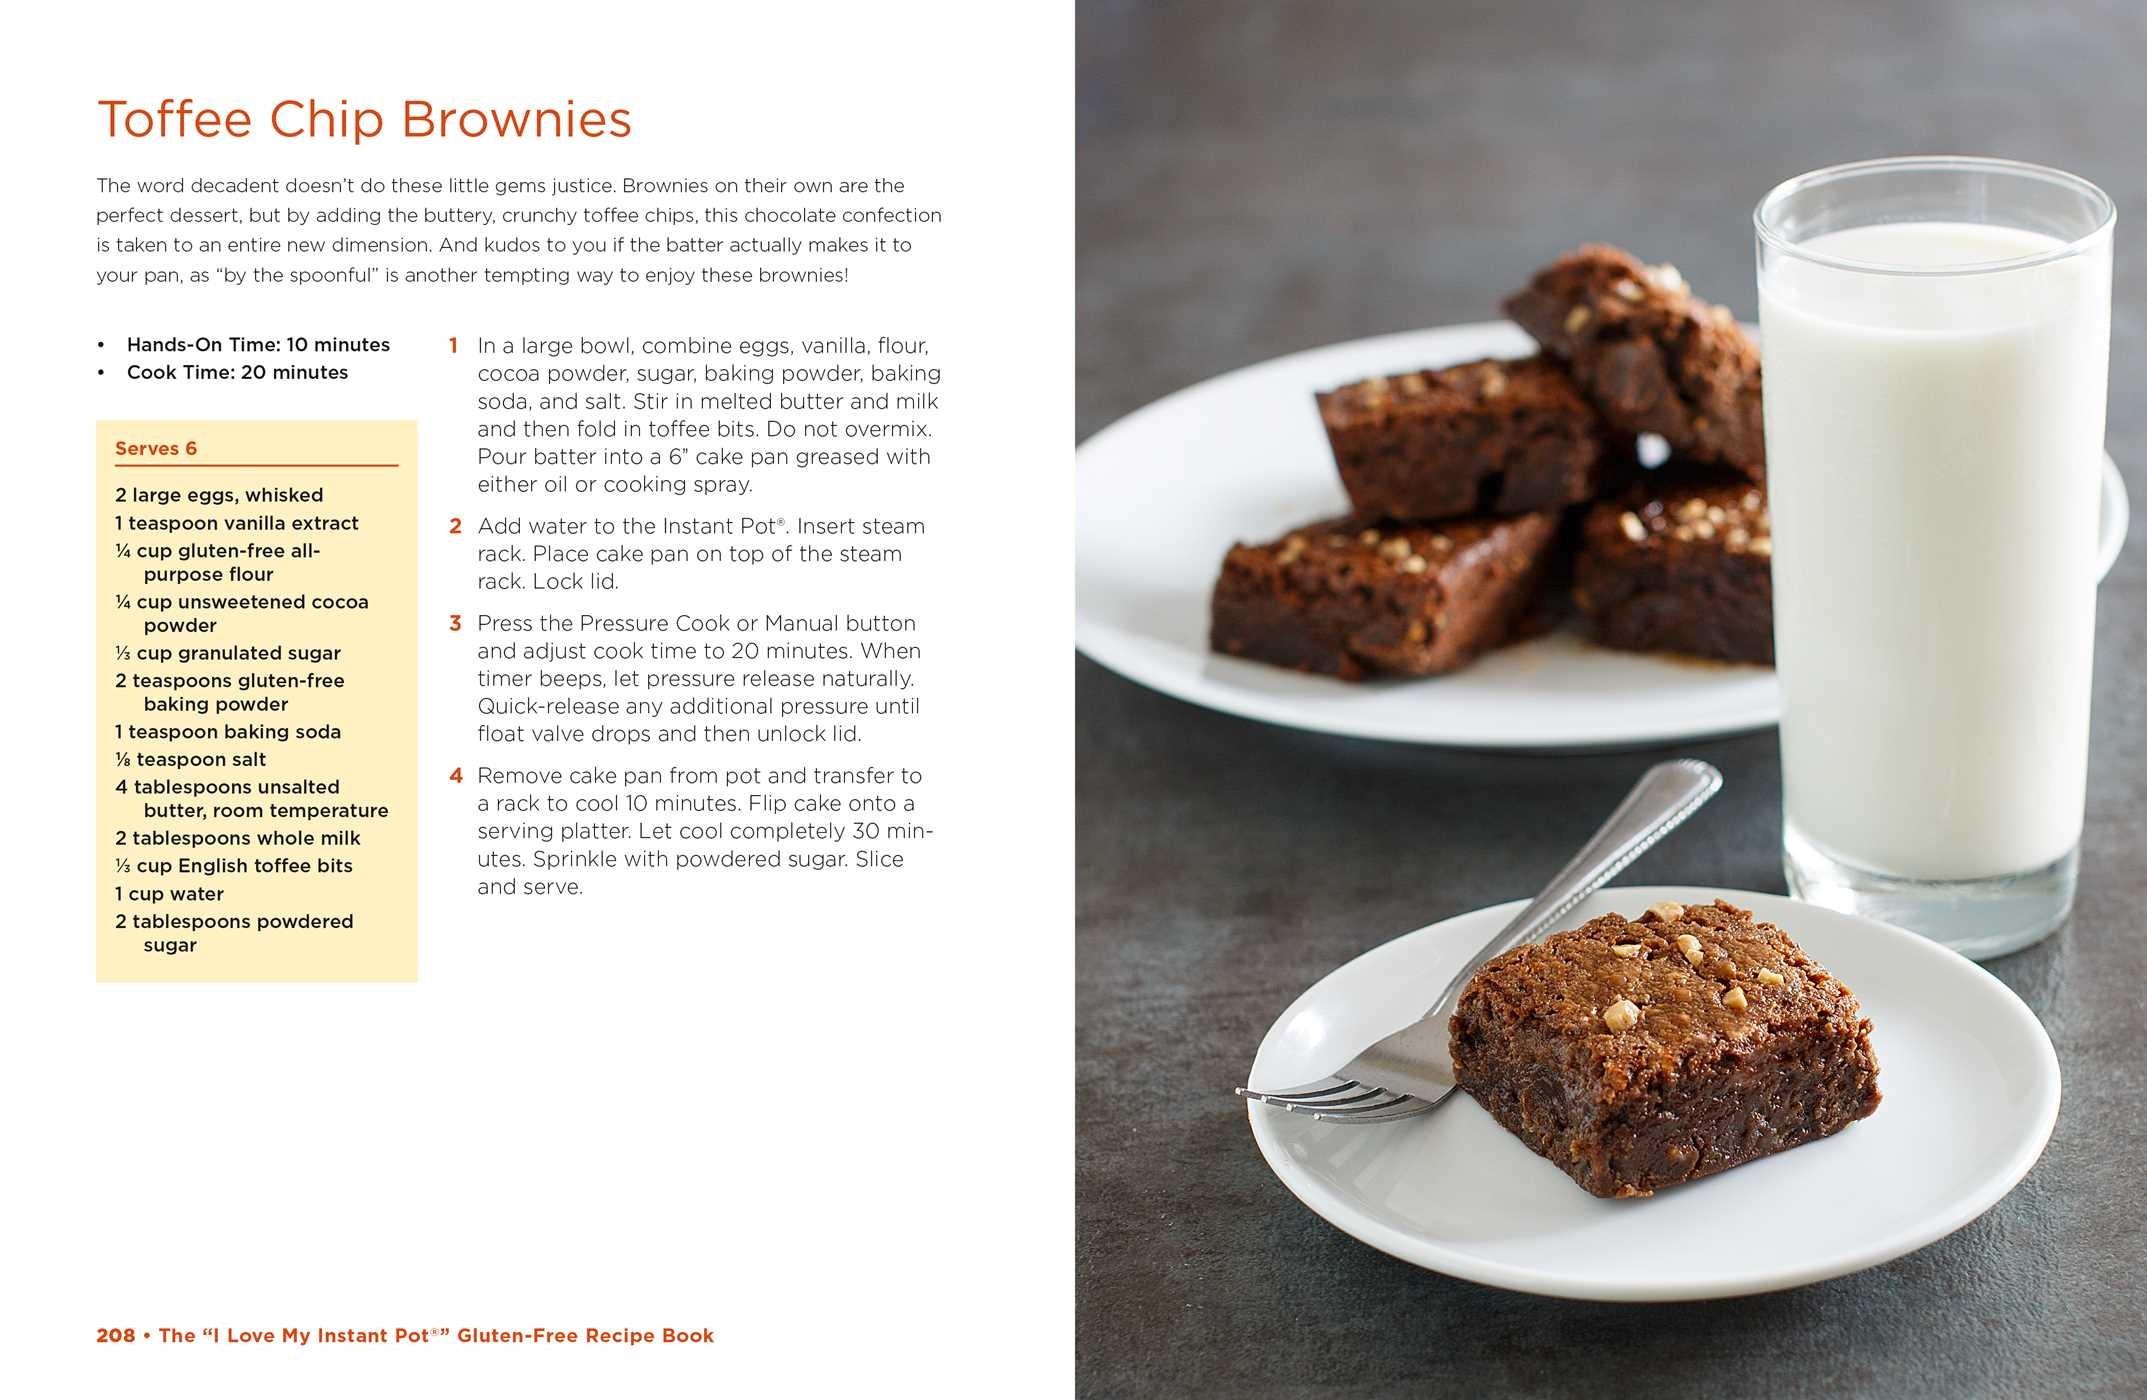 The i love my instant pot gluten free recipe book 9781507208717.in06